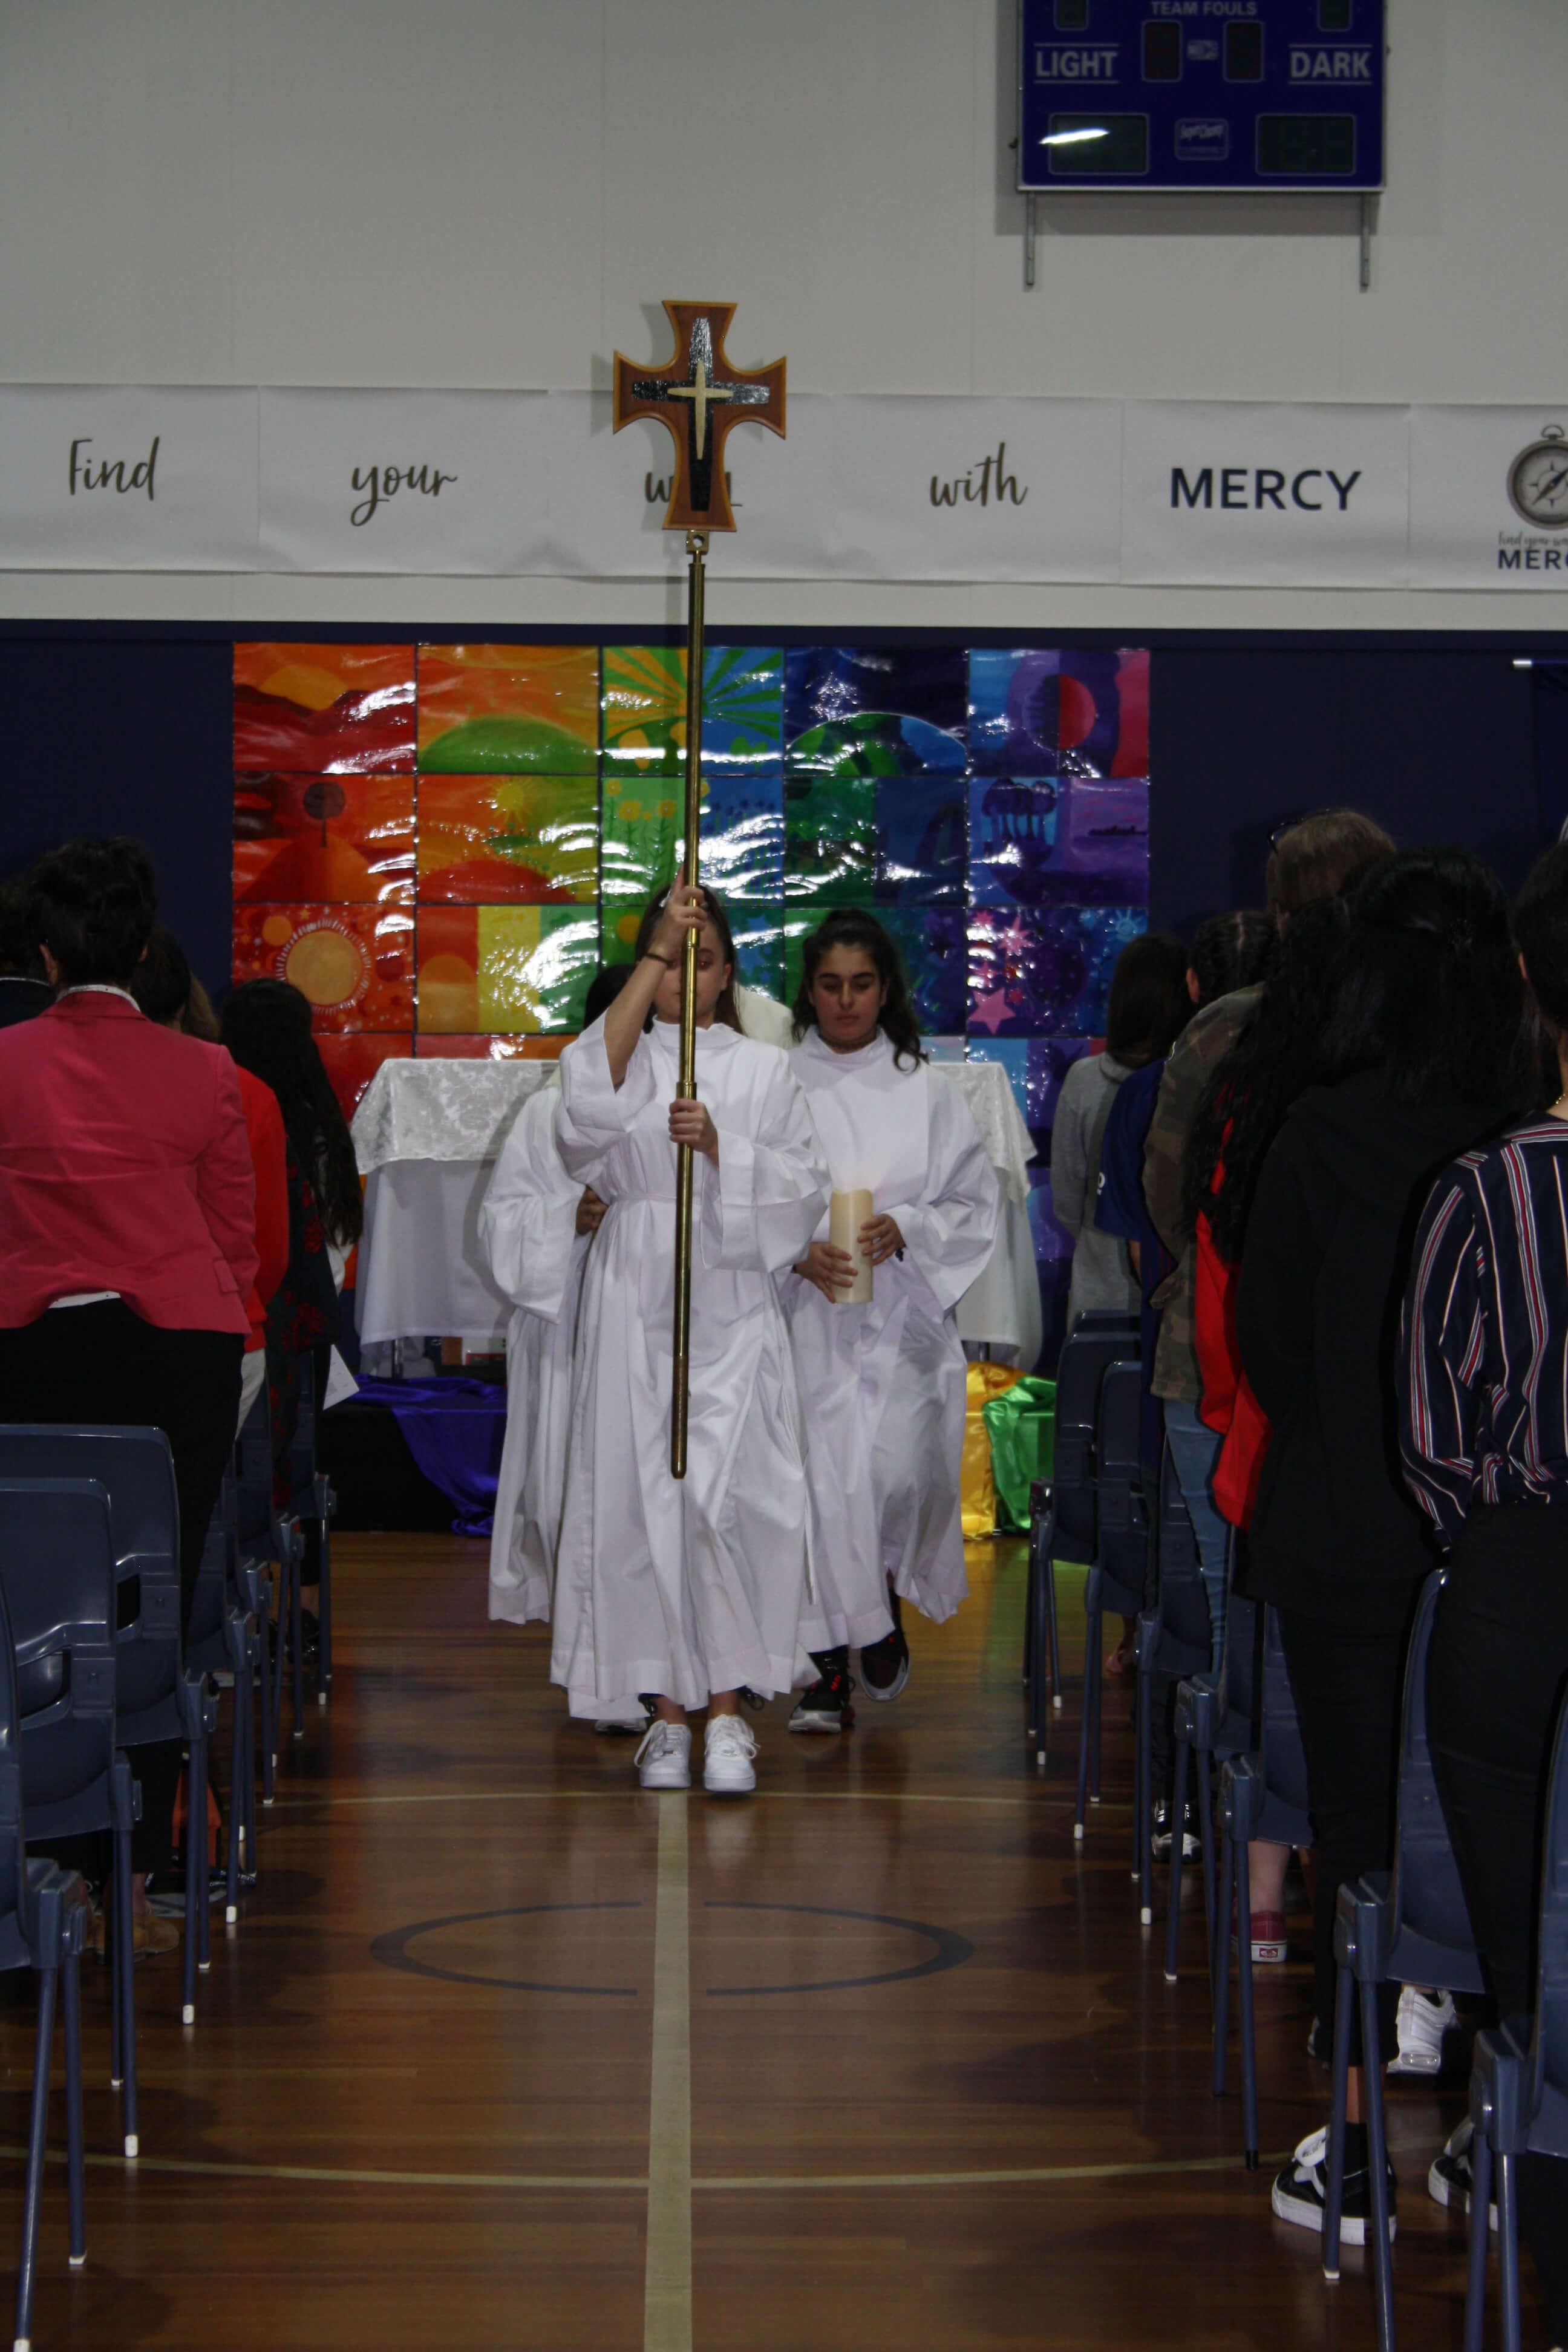 Mercy Day 2019